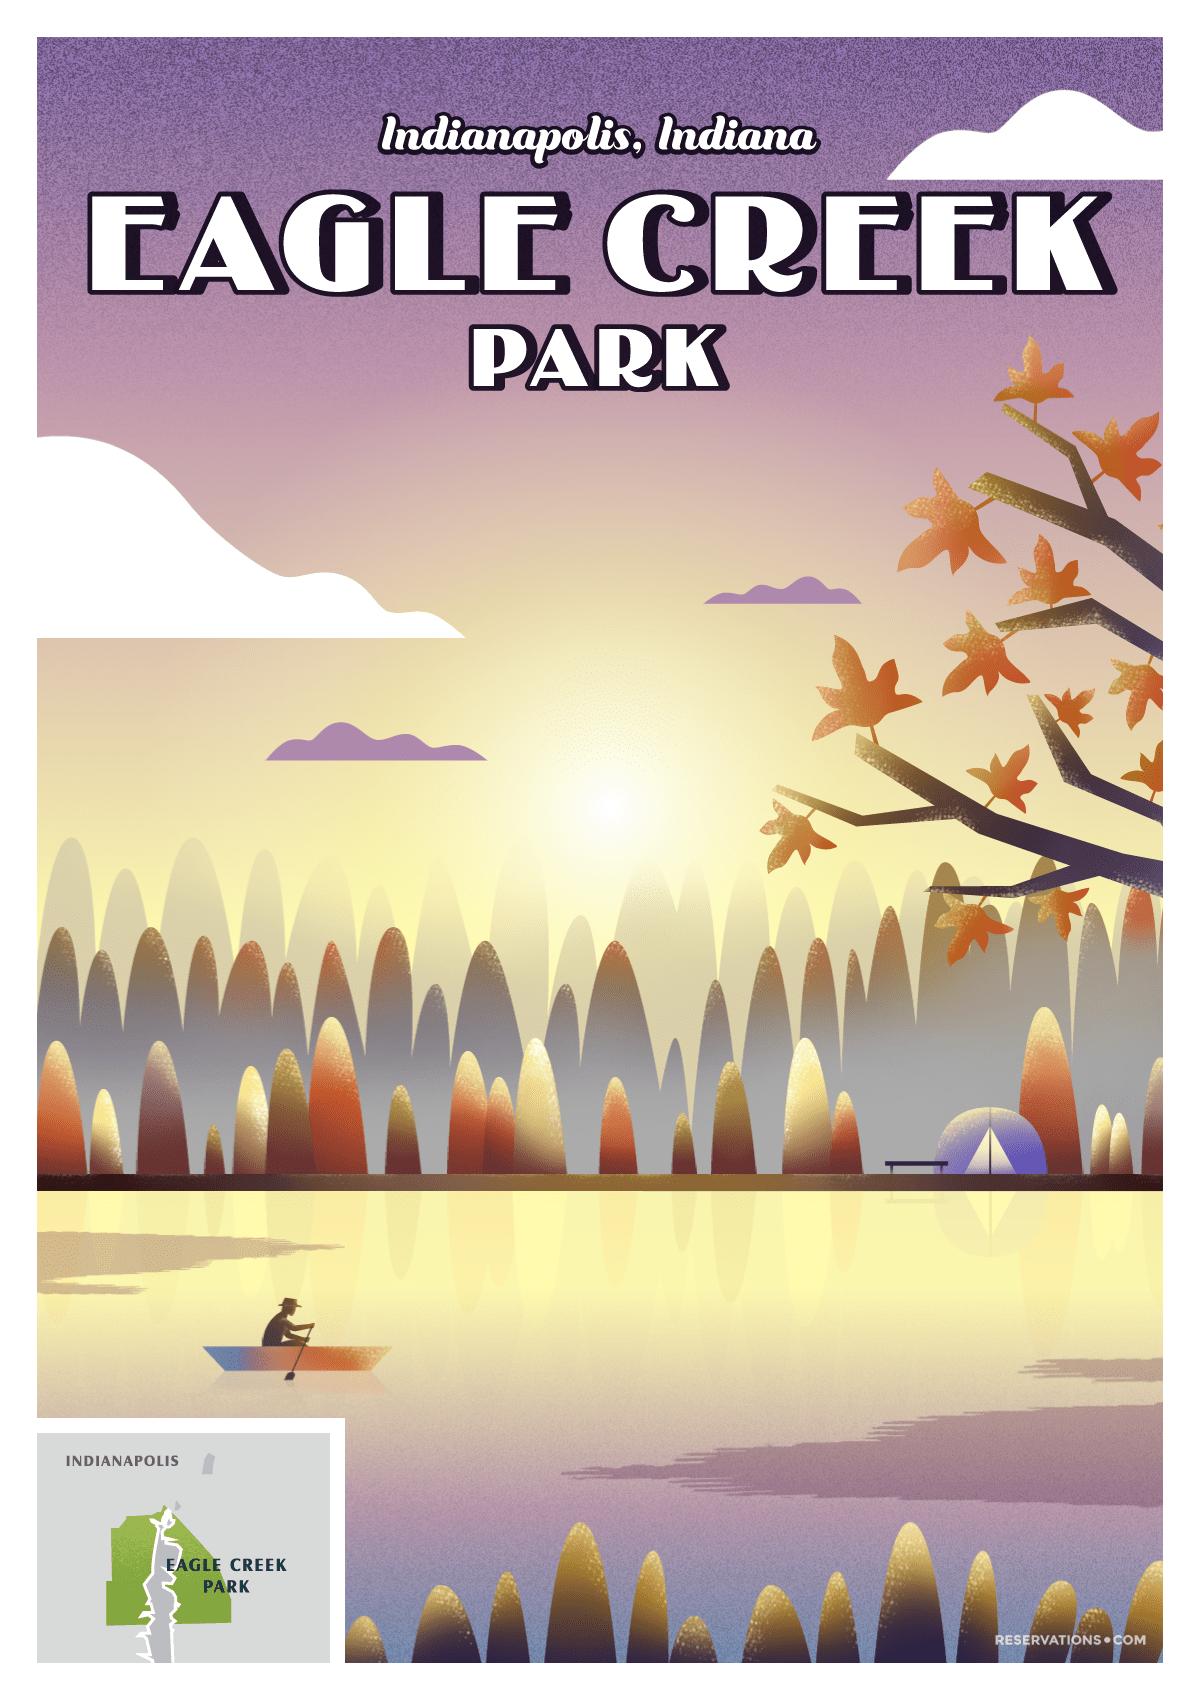 Eagle Creek Park Indianapolis, Indiana poster